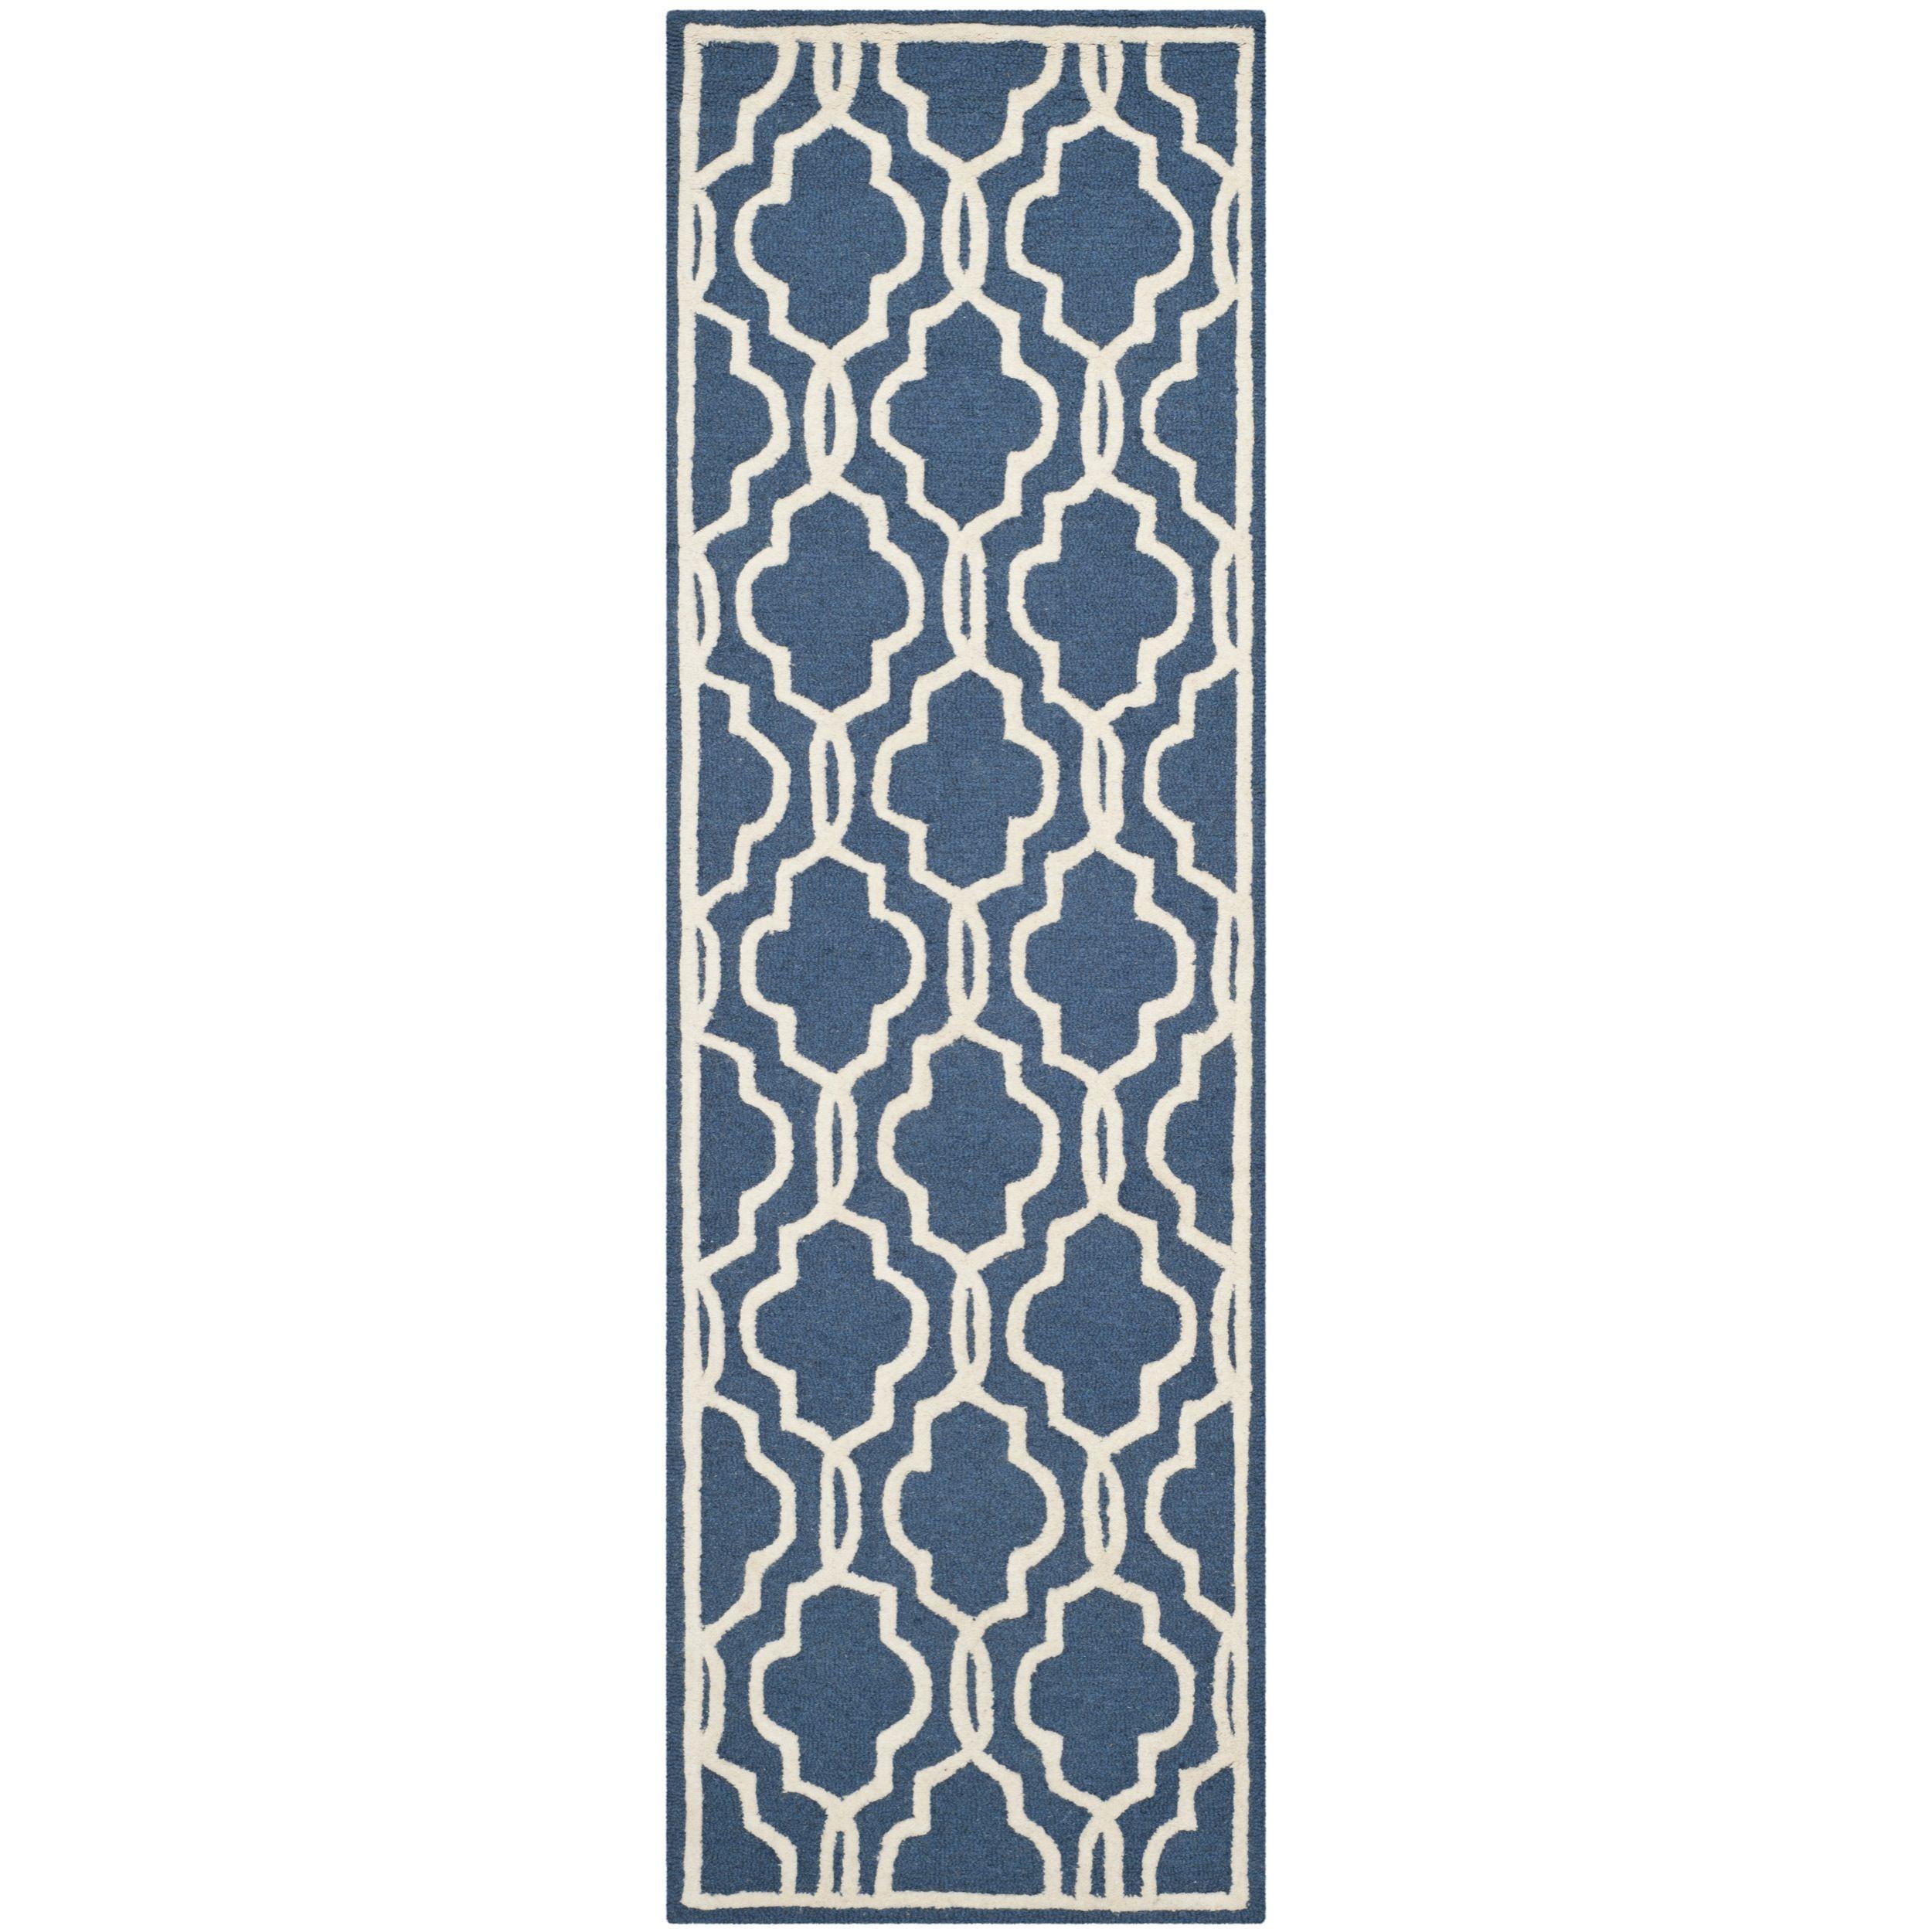 Navy hallway ideas  Safavieh Handmade Moroccan Cambridge Navy Ivory Wool Rug u x